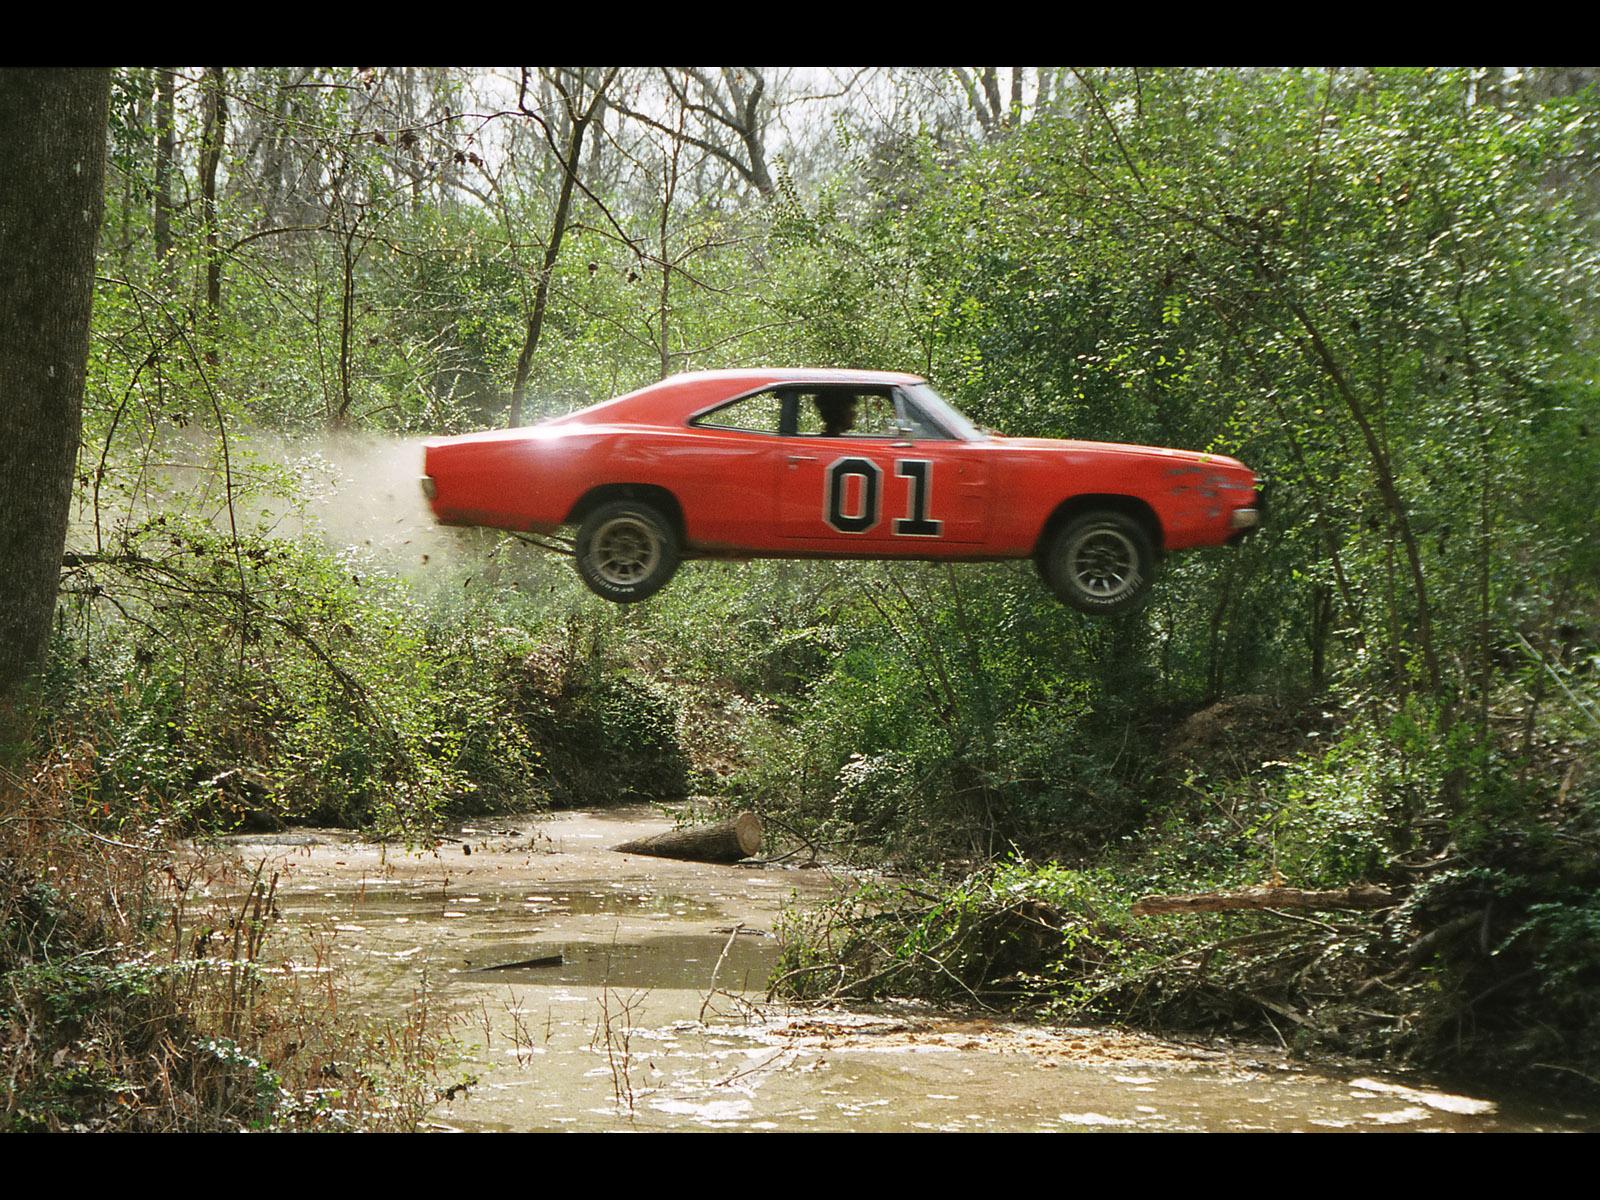 http://1.bp.blogspot.com/-Z2JeO7bDdFM/T4dxvmO35II/AAAAAAAABUE/BFbYcrPiTcI/s1600/1969-Dodge-Charger-General-Lee-DOH-Jump-Swamp-1600x1200.jpg